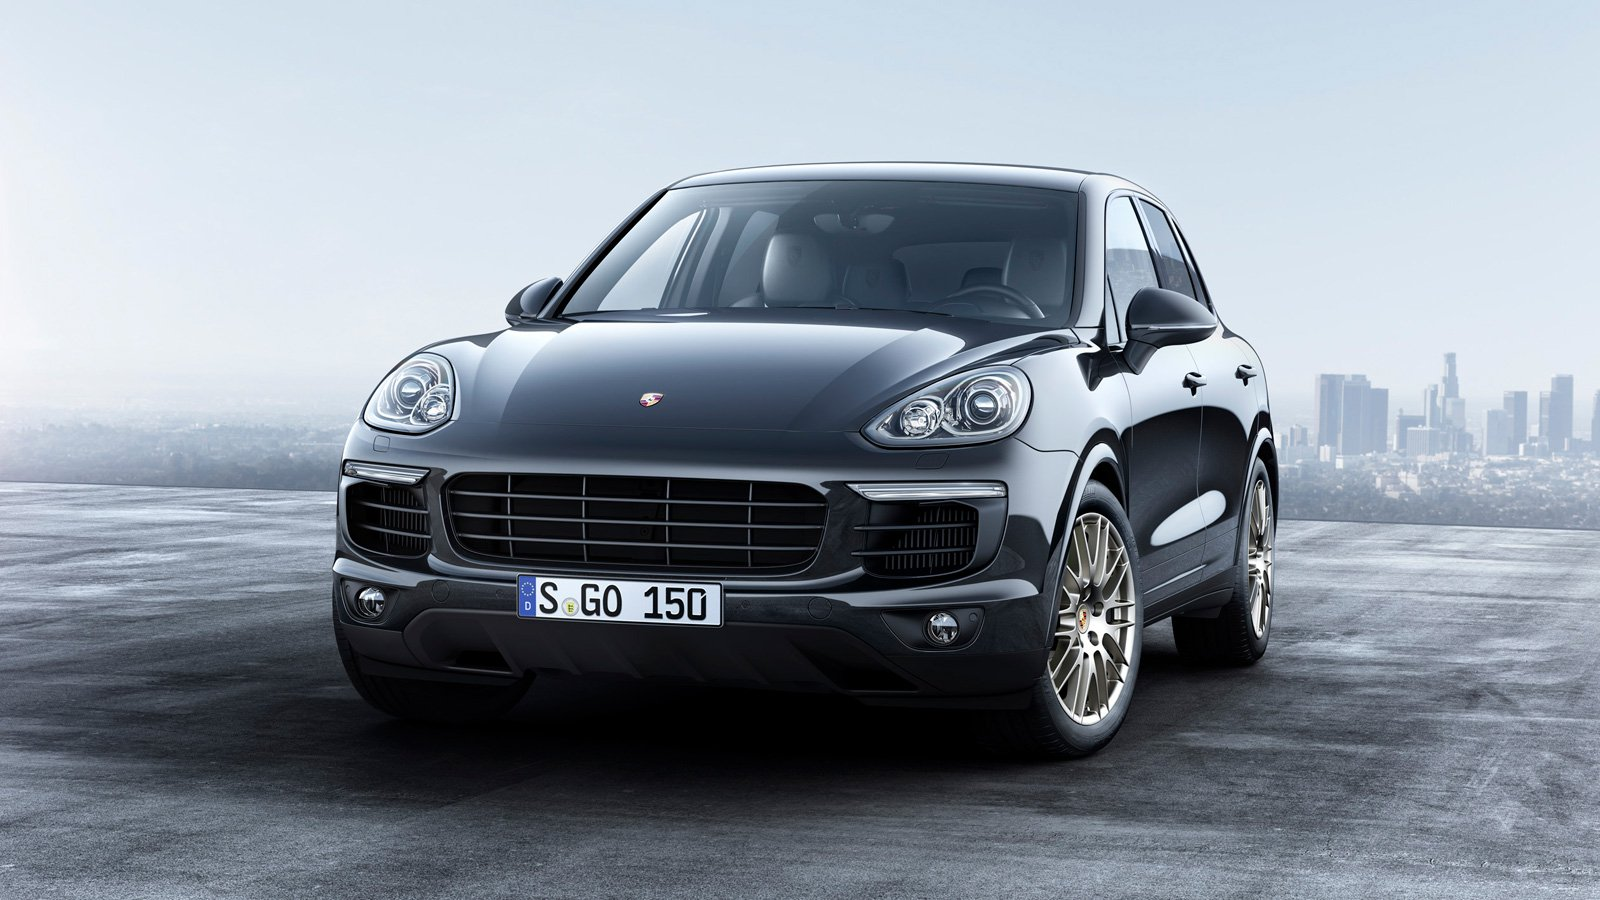 Porsche Cayenne Adds Luxury Platinum Edition to Its Lineup